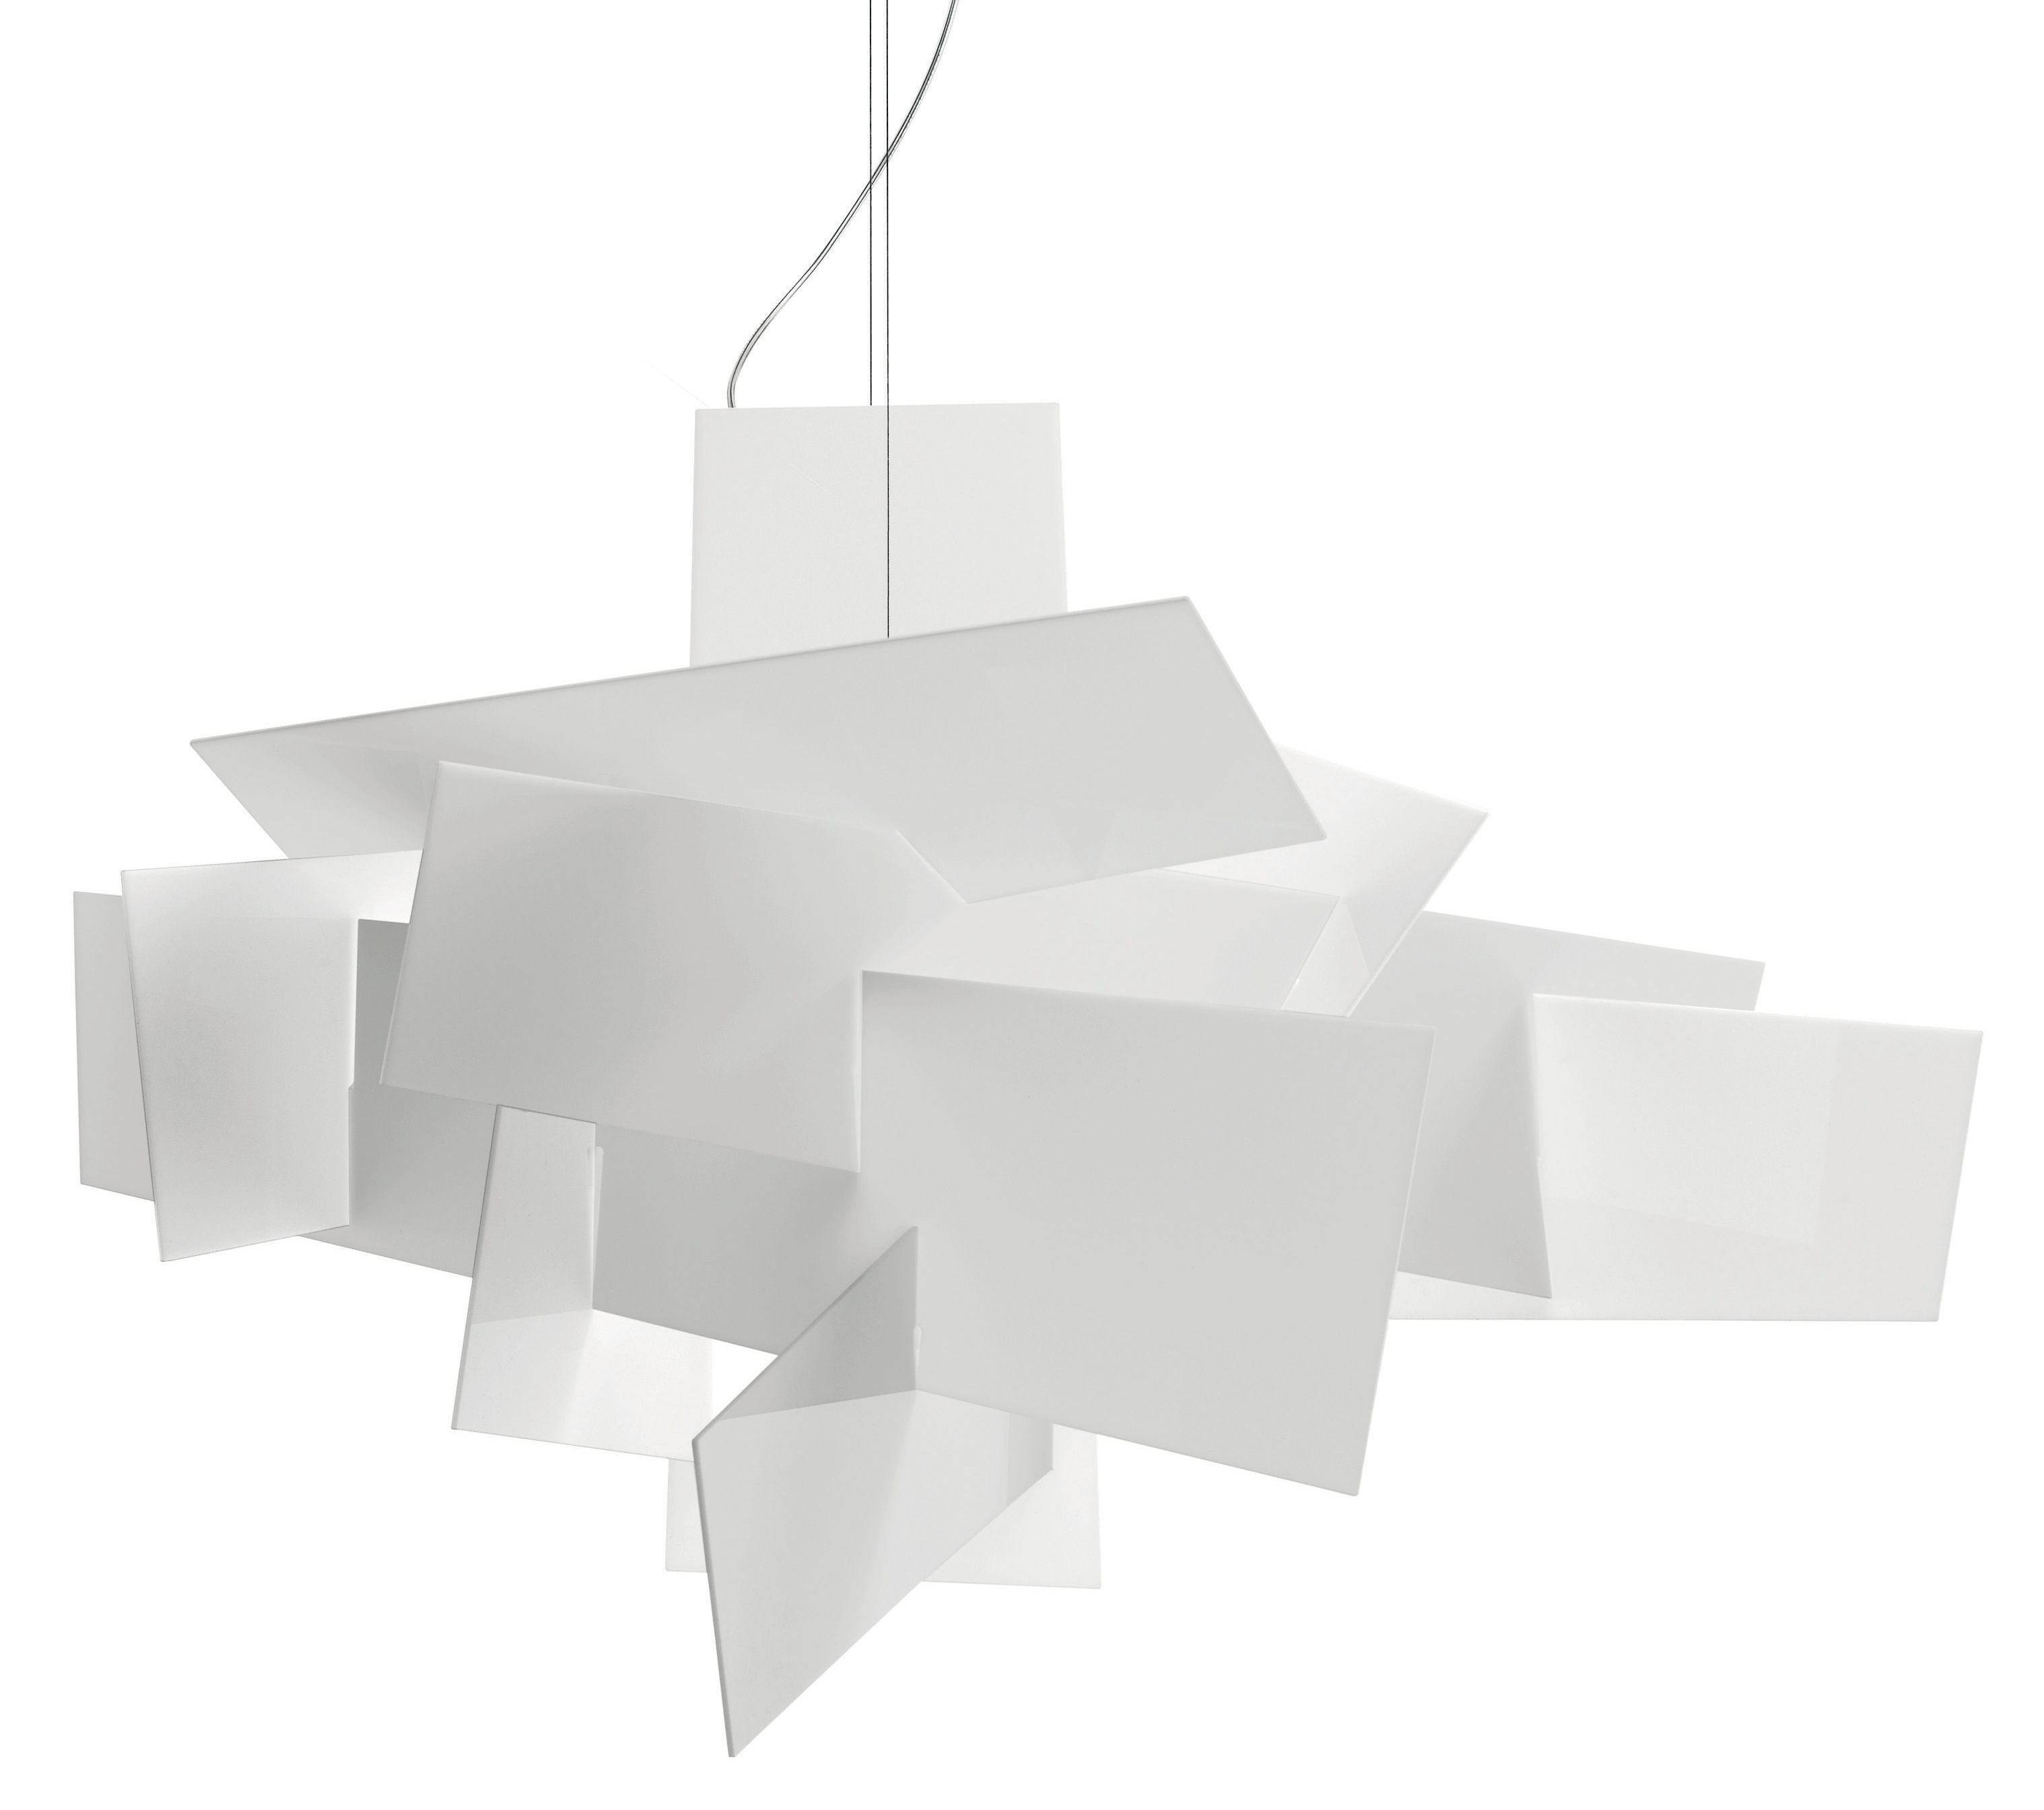 Leuchten - Pendelleuchten - Big Bang Pendelleuchte LED / Ø 96 cm - Foscarini - Weiß - Acier inox, Aluminium laqué époxy, Polykarbonat